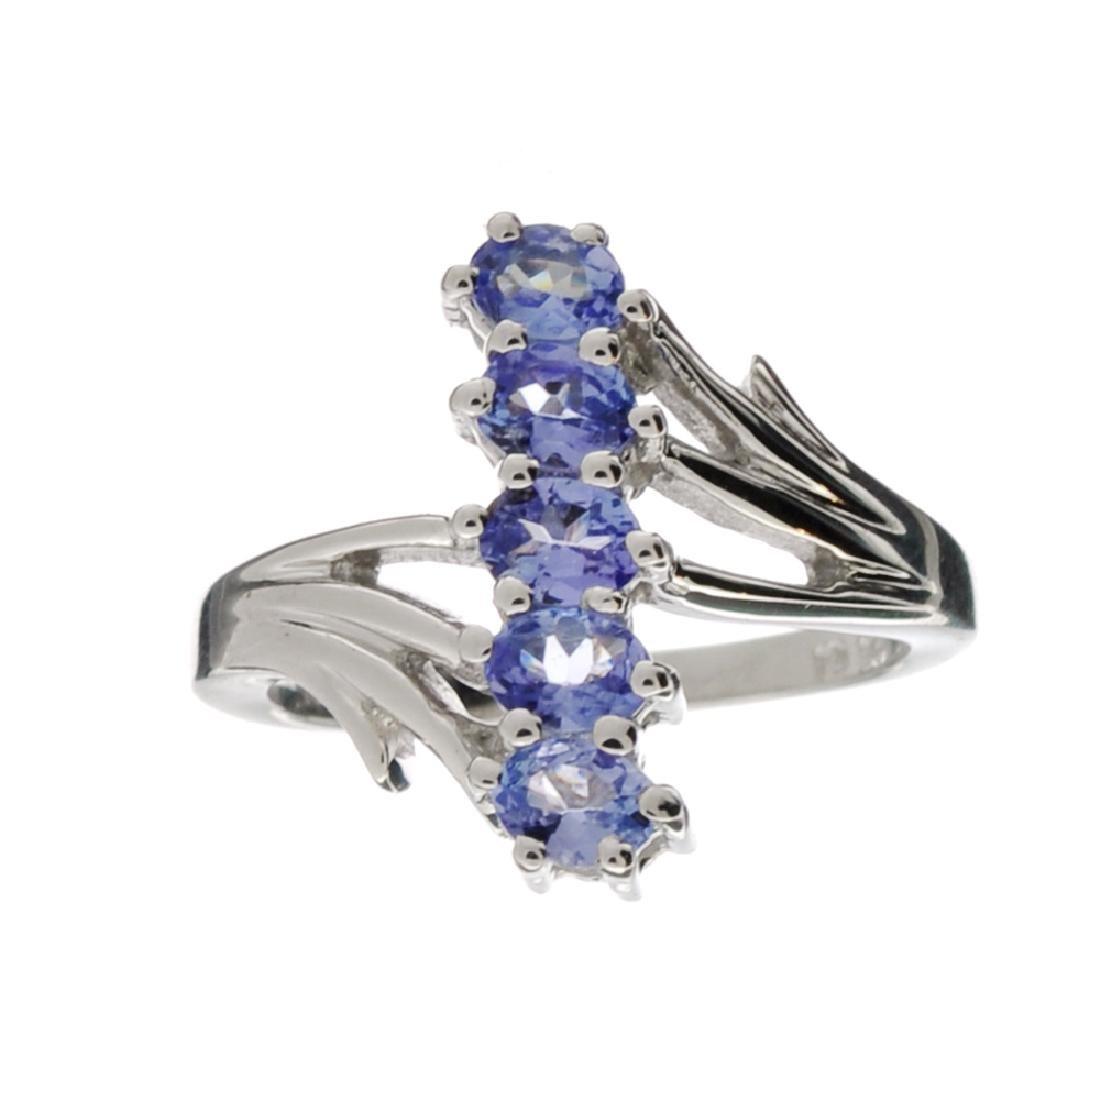 APP: 0.9k Fine Jewelry 0.80CT Oval Cut Tanzanite And